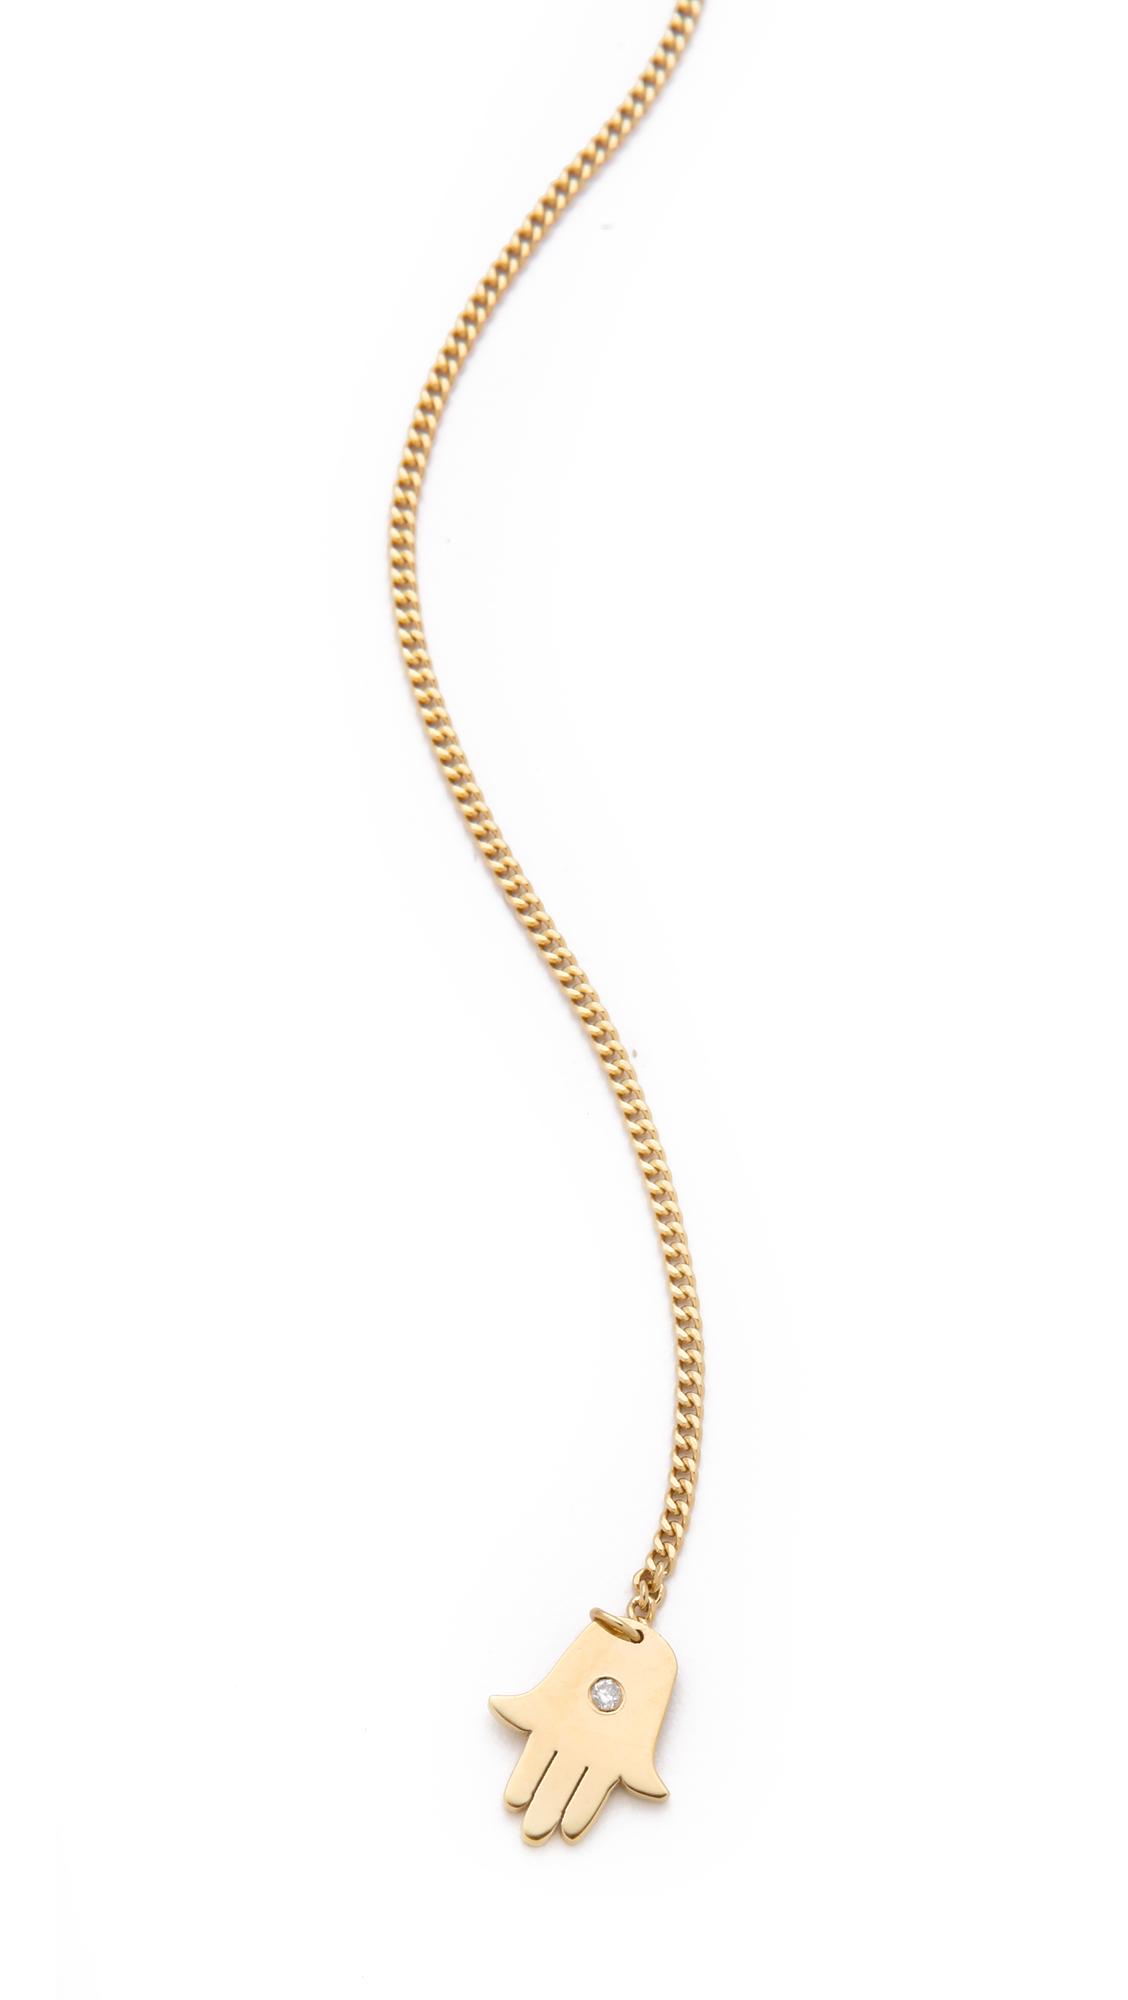 Jennifer zeuner jewelry mini eye & hamsa necklace